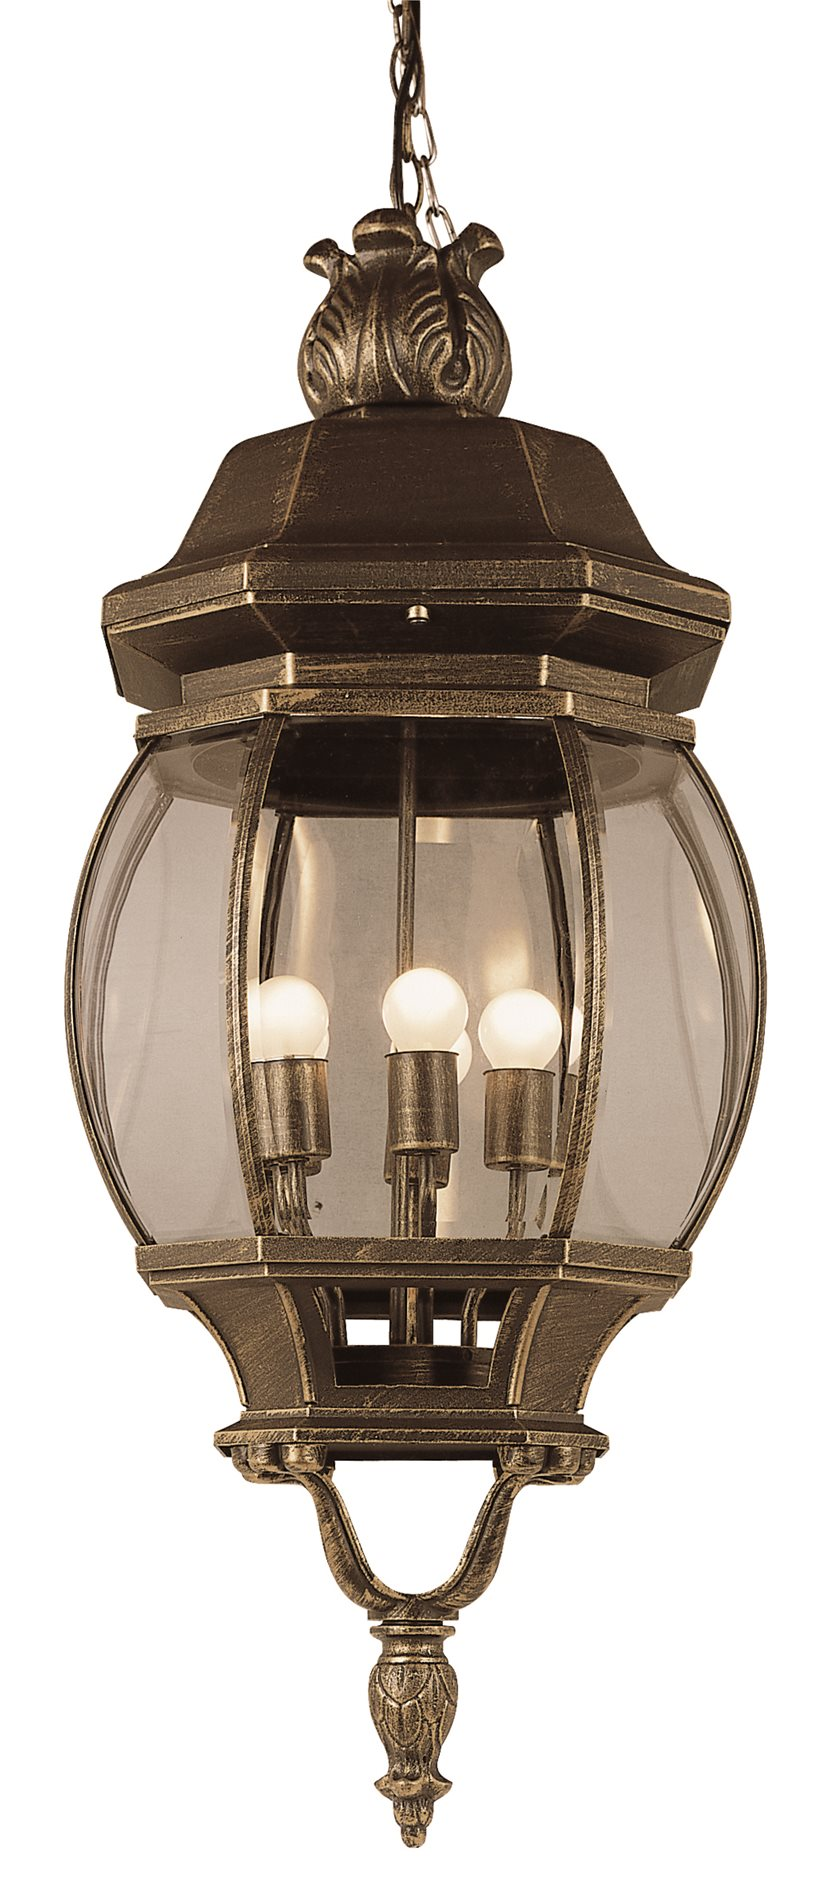 trans globe lighting 4067 traditional outdoor hanging light tg 4067. Black Bedroom Furniture Sets. Home Design Ideas